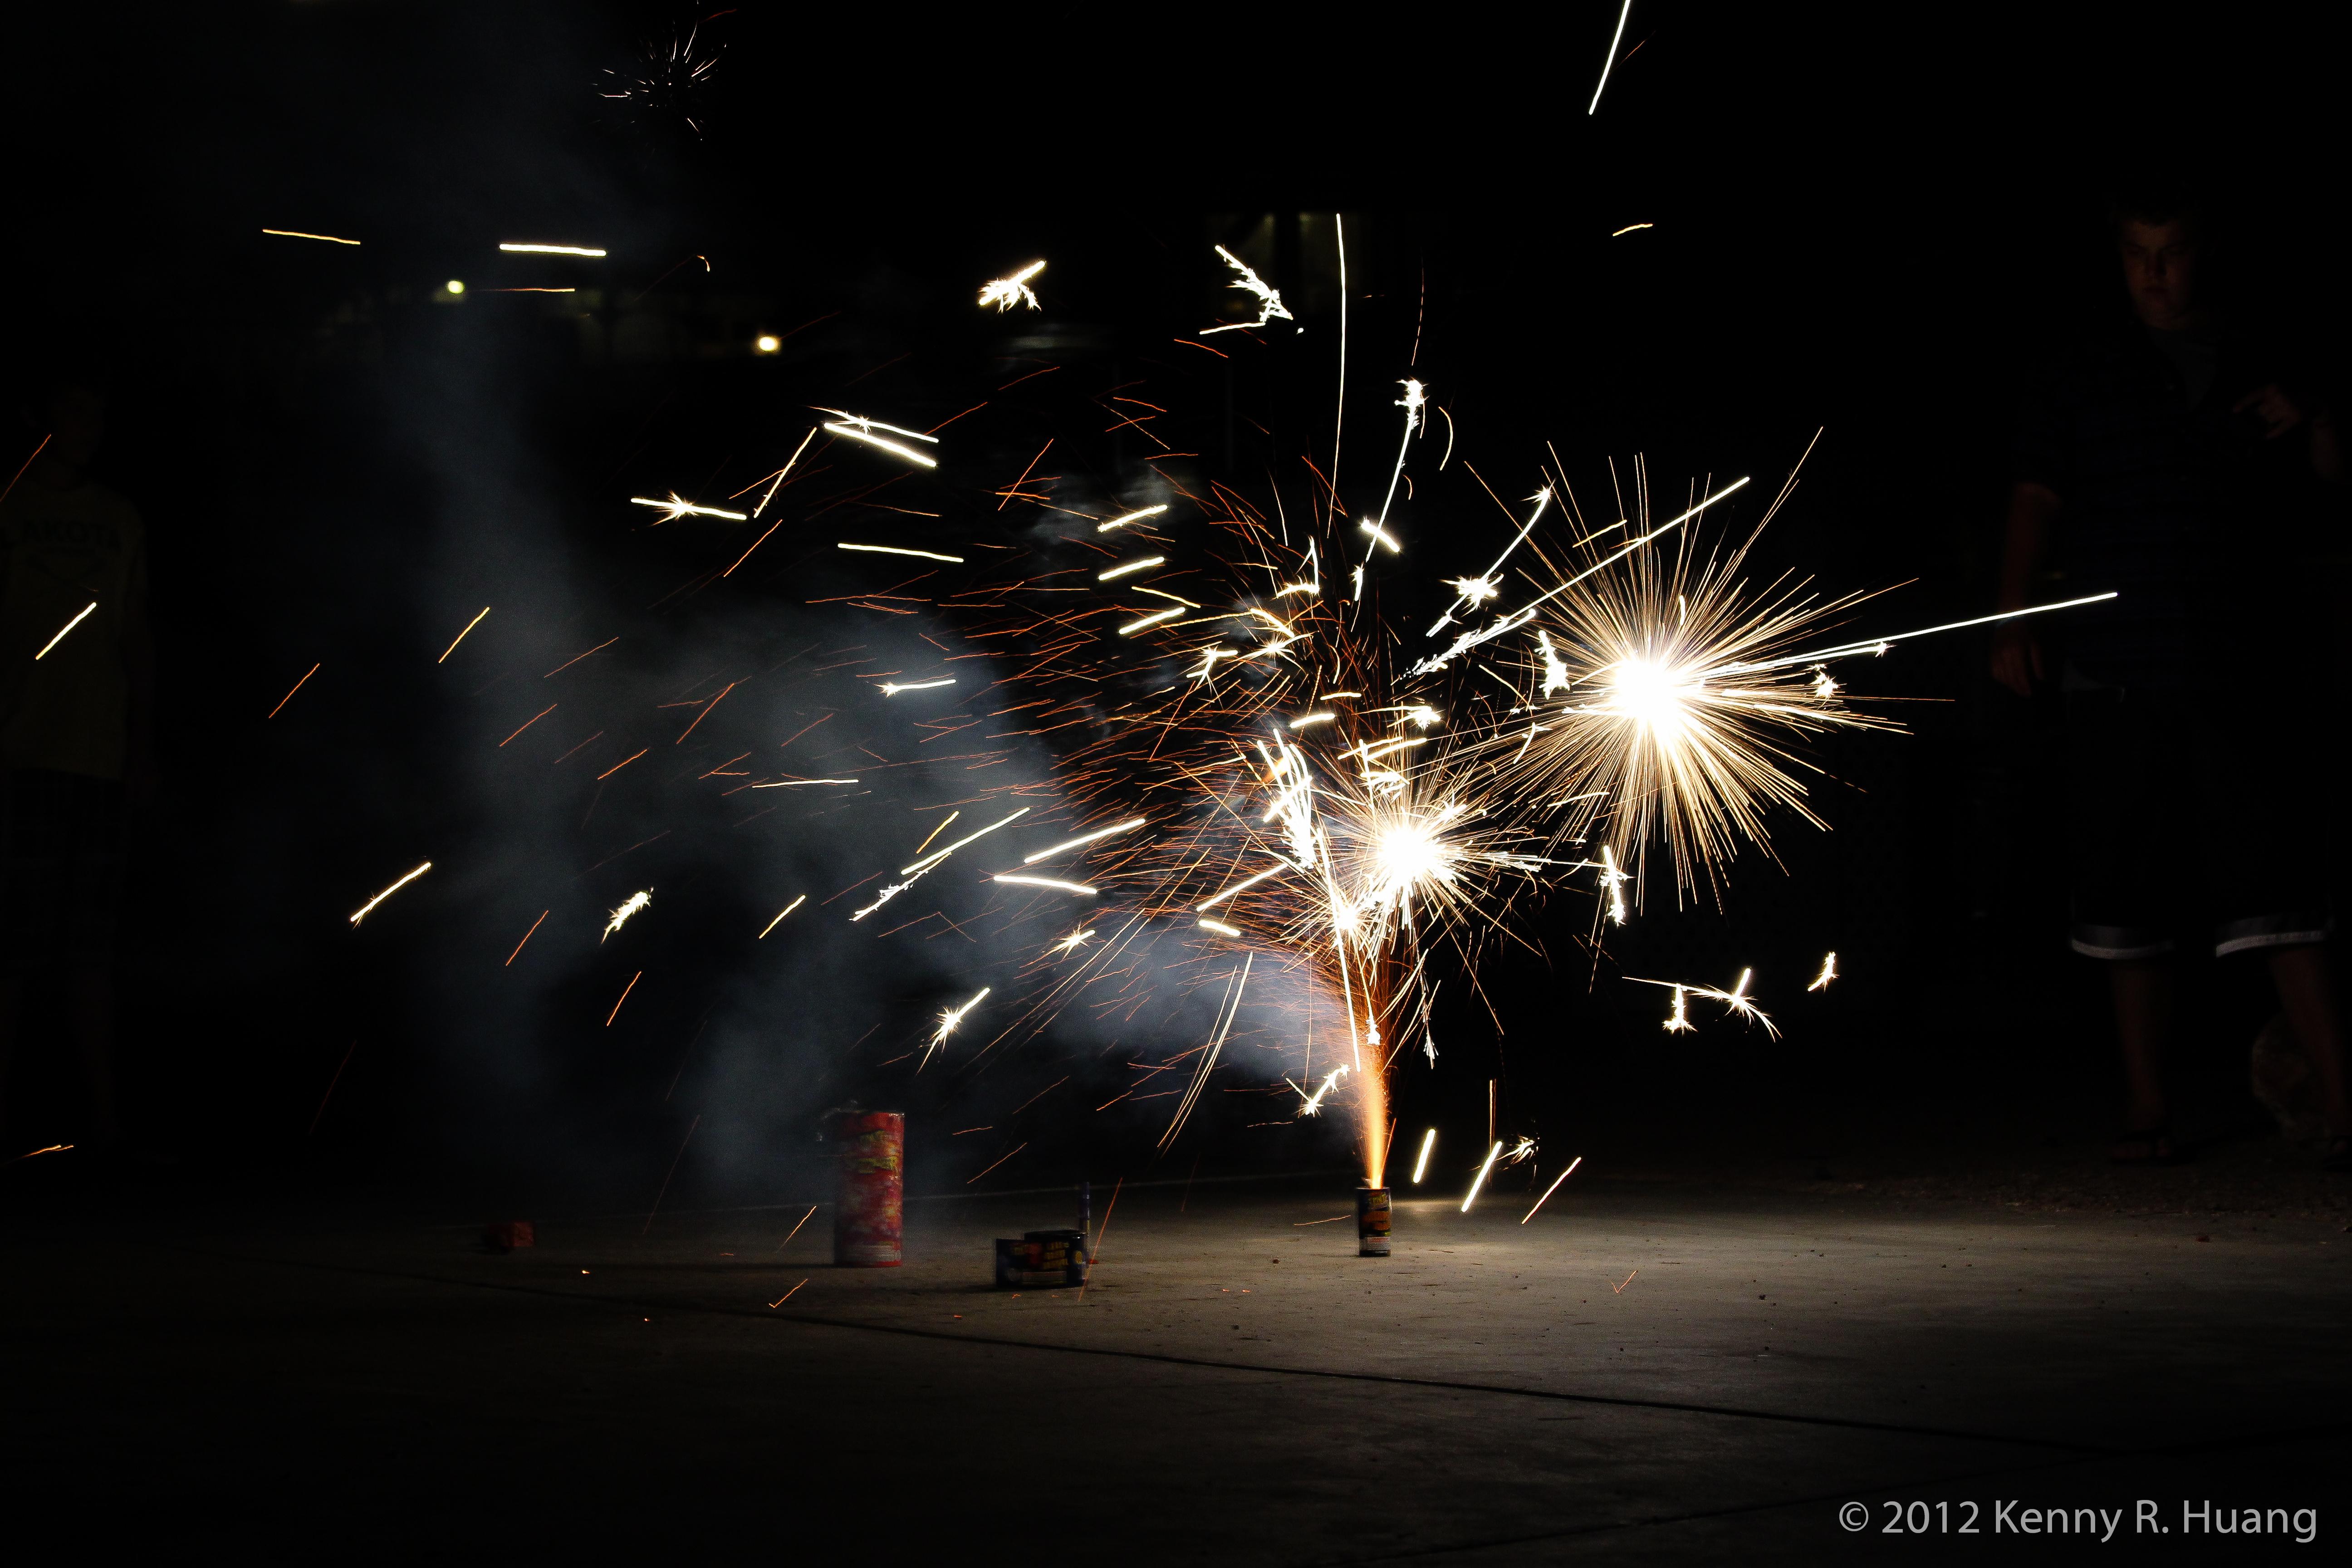 2012-kenny-r-huang-8668